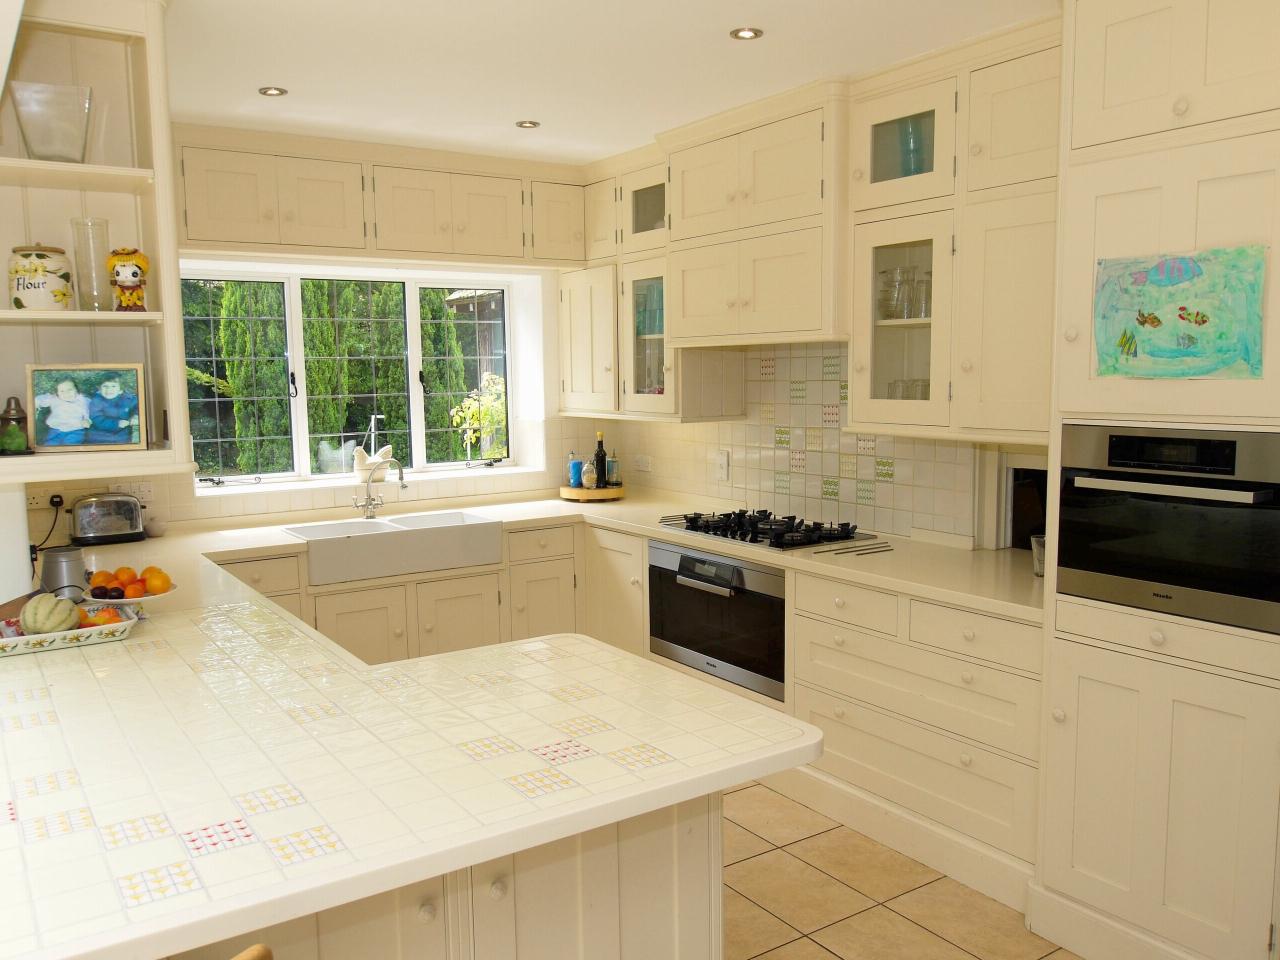 6 bedroom detached house Sold in Sevenoaks - Photograph 4